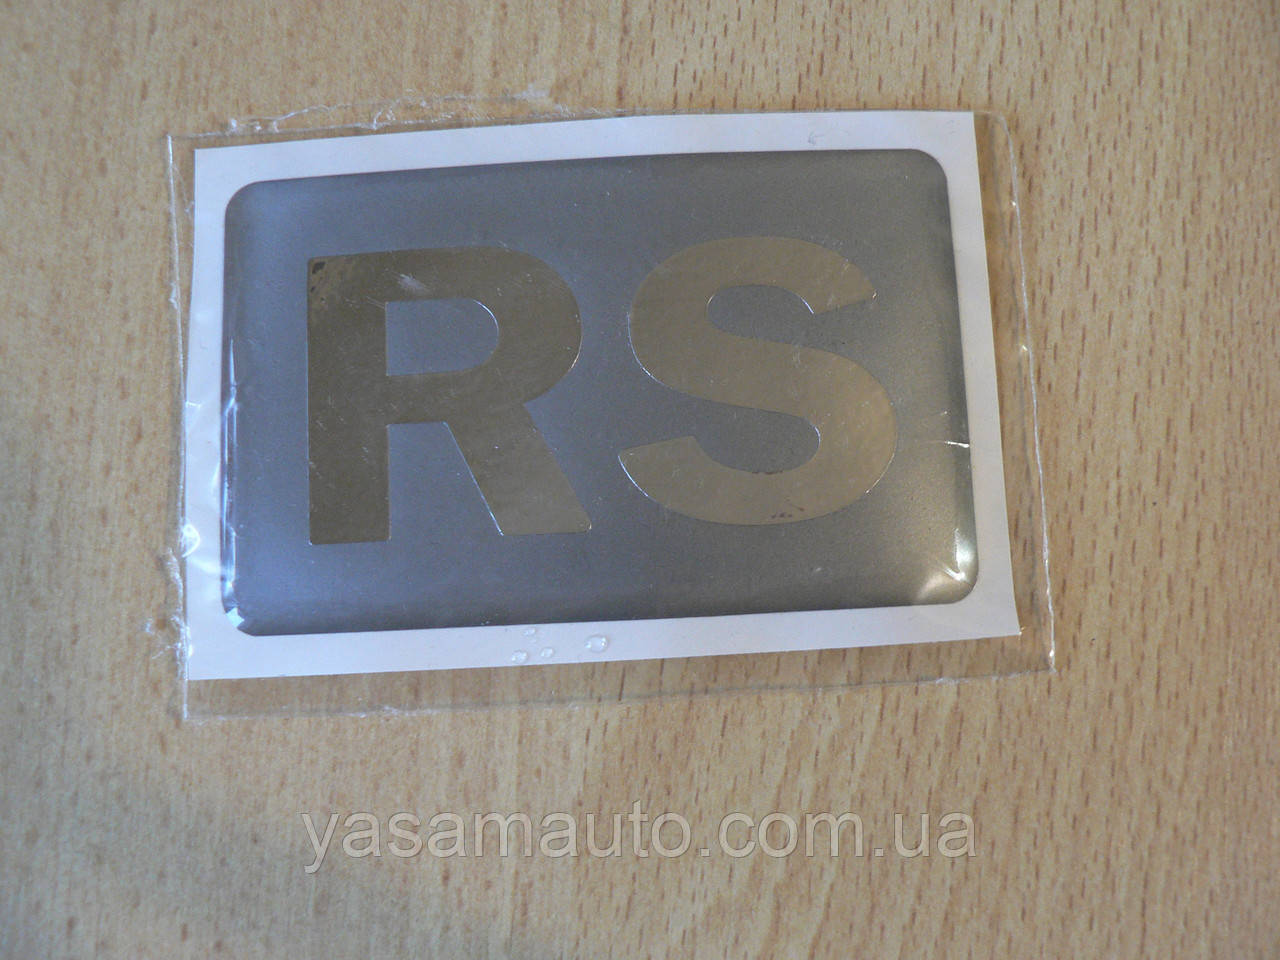 Наклейка s надпись RS 80х50х1мм силиконовая полоска на авто надпись логотип РС медальон